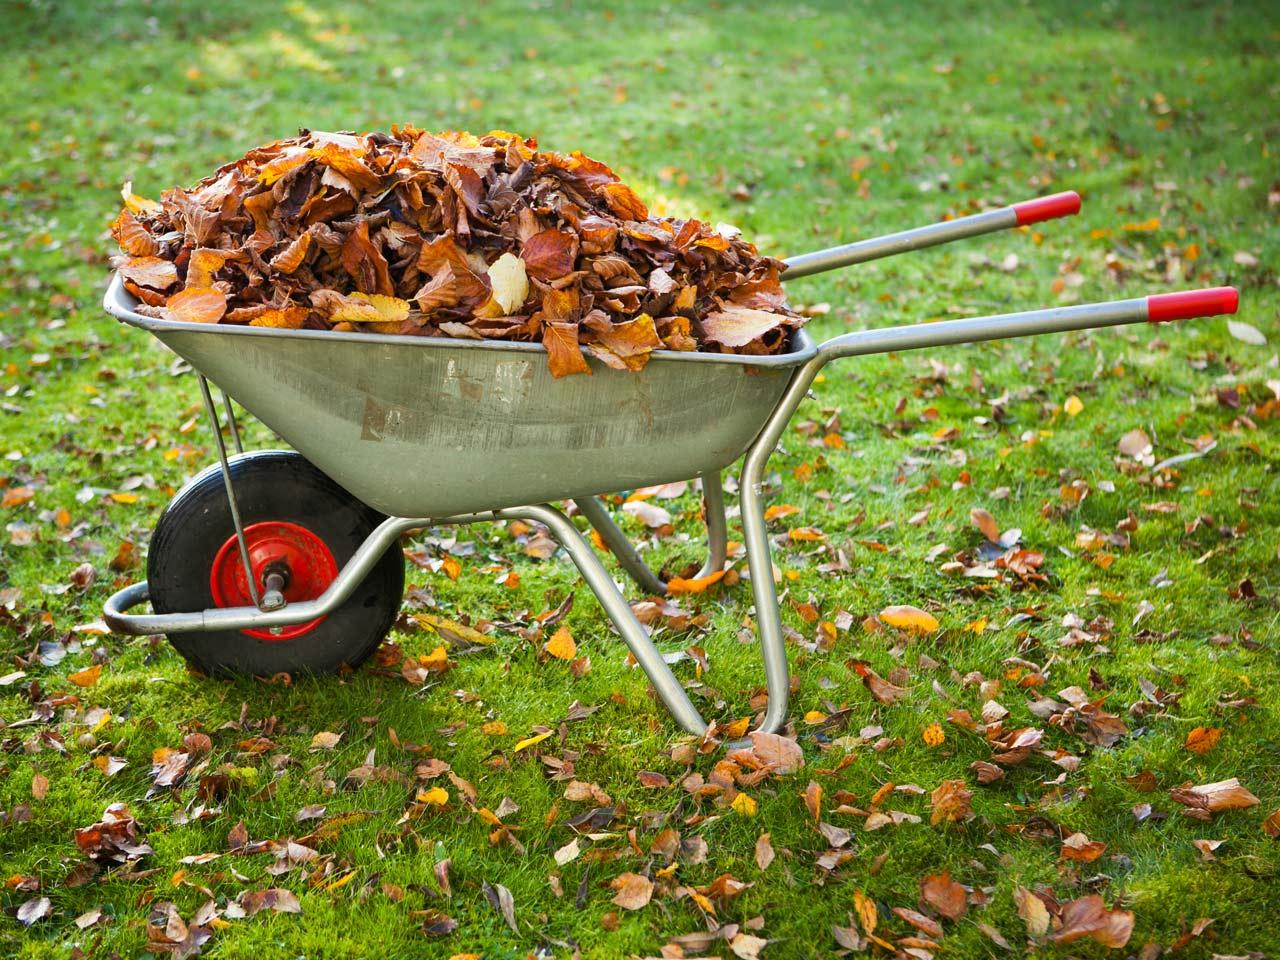 autumn garden jobs to prepare for next year saga